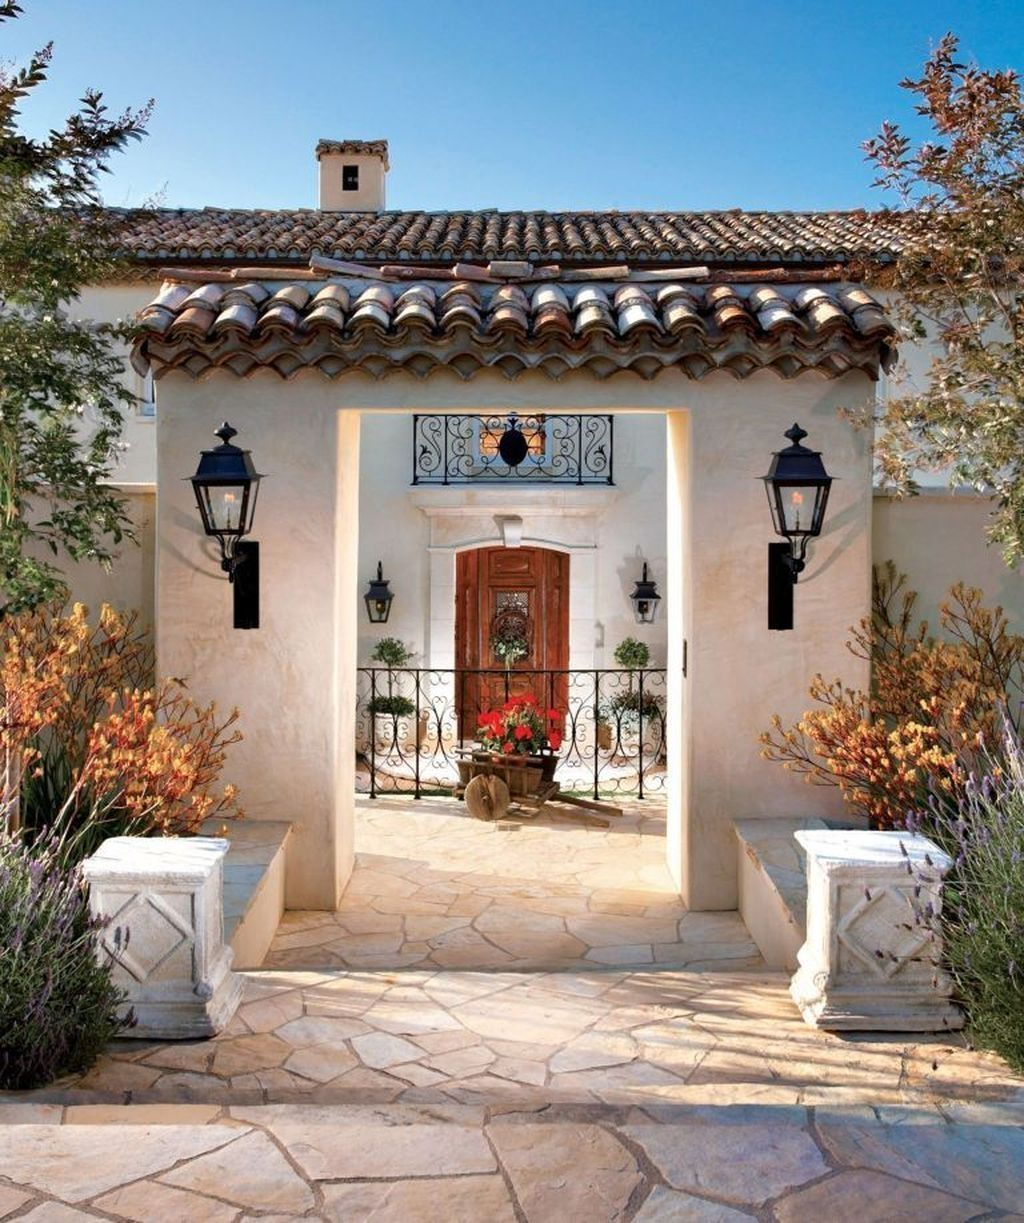 30 Trendy Mediterranean Home Decor Ideas To Apply Asap In 2020